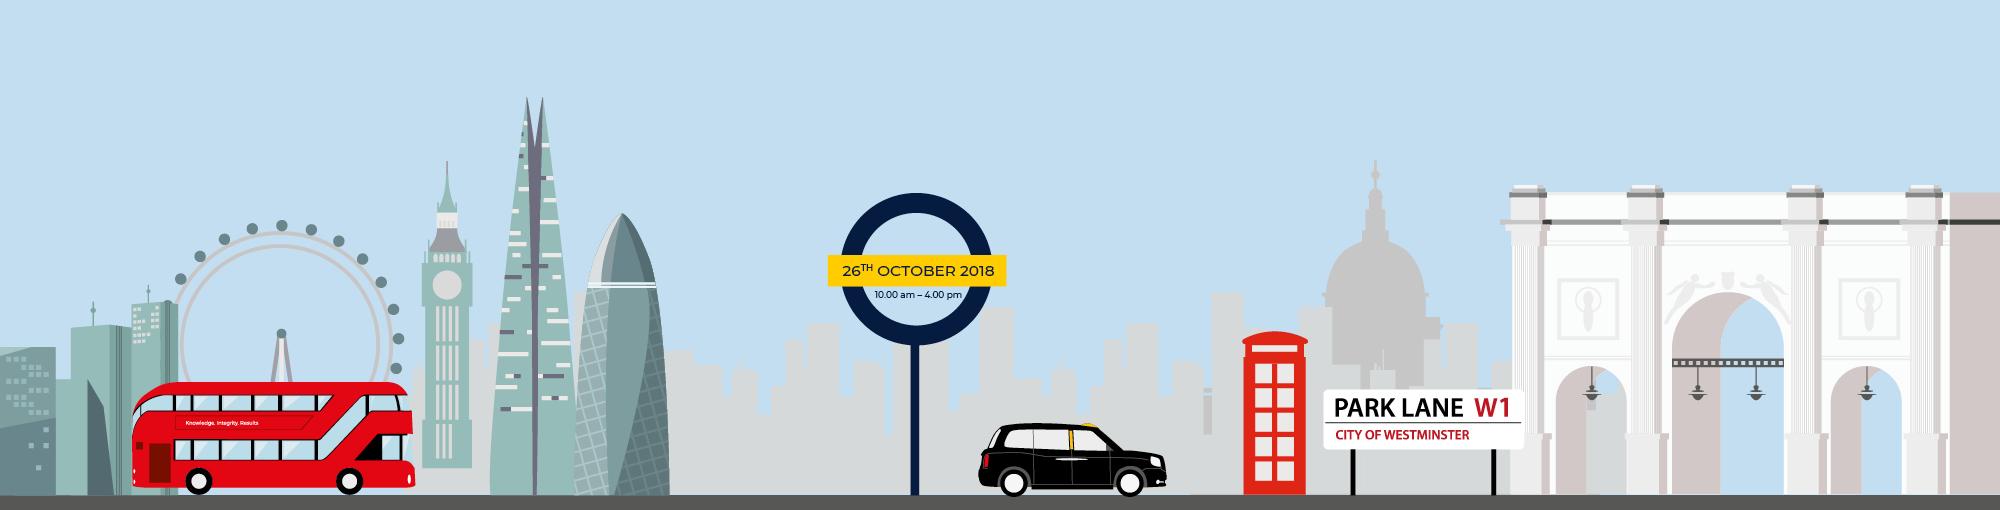 woodhead_-_website_header_londons_looking_-_26th_oct